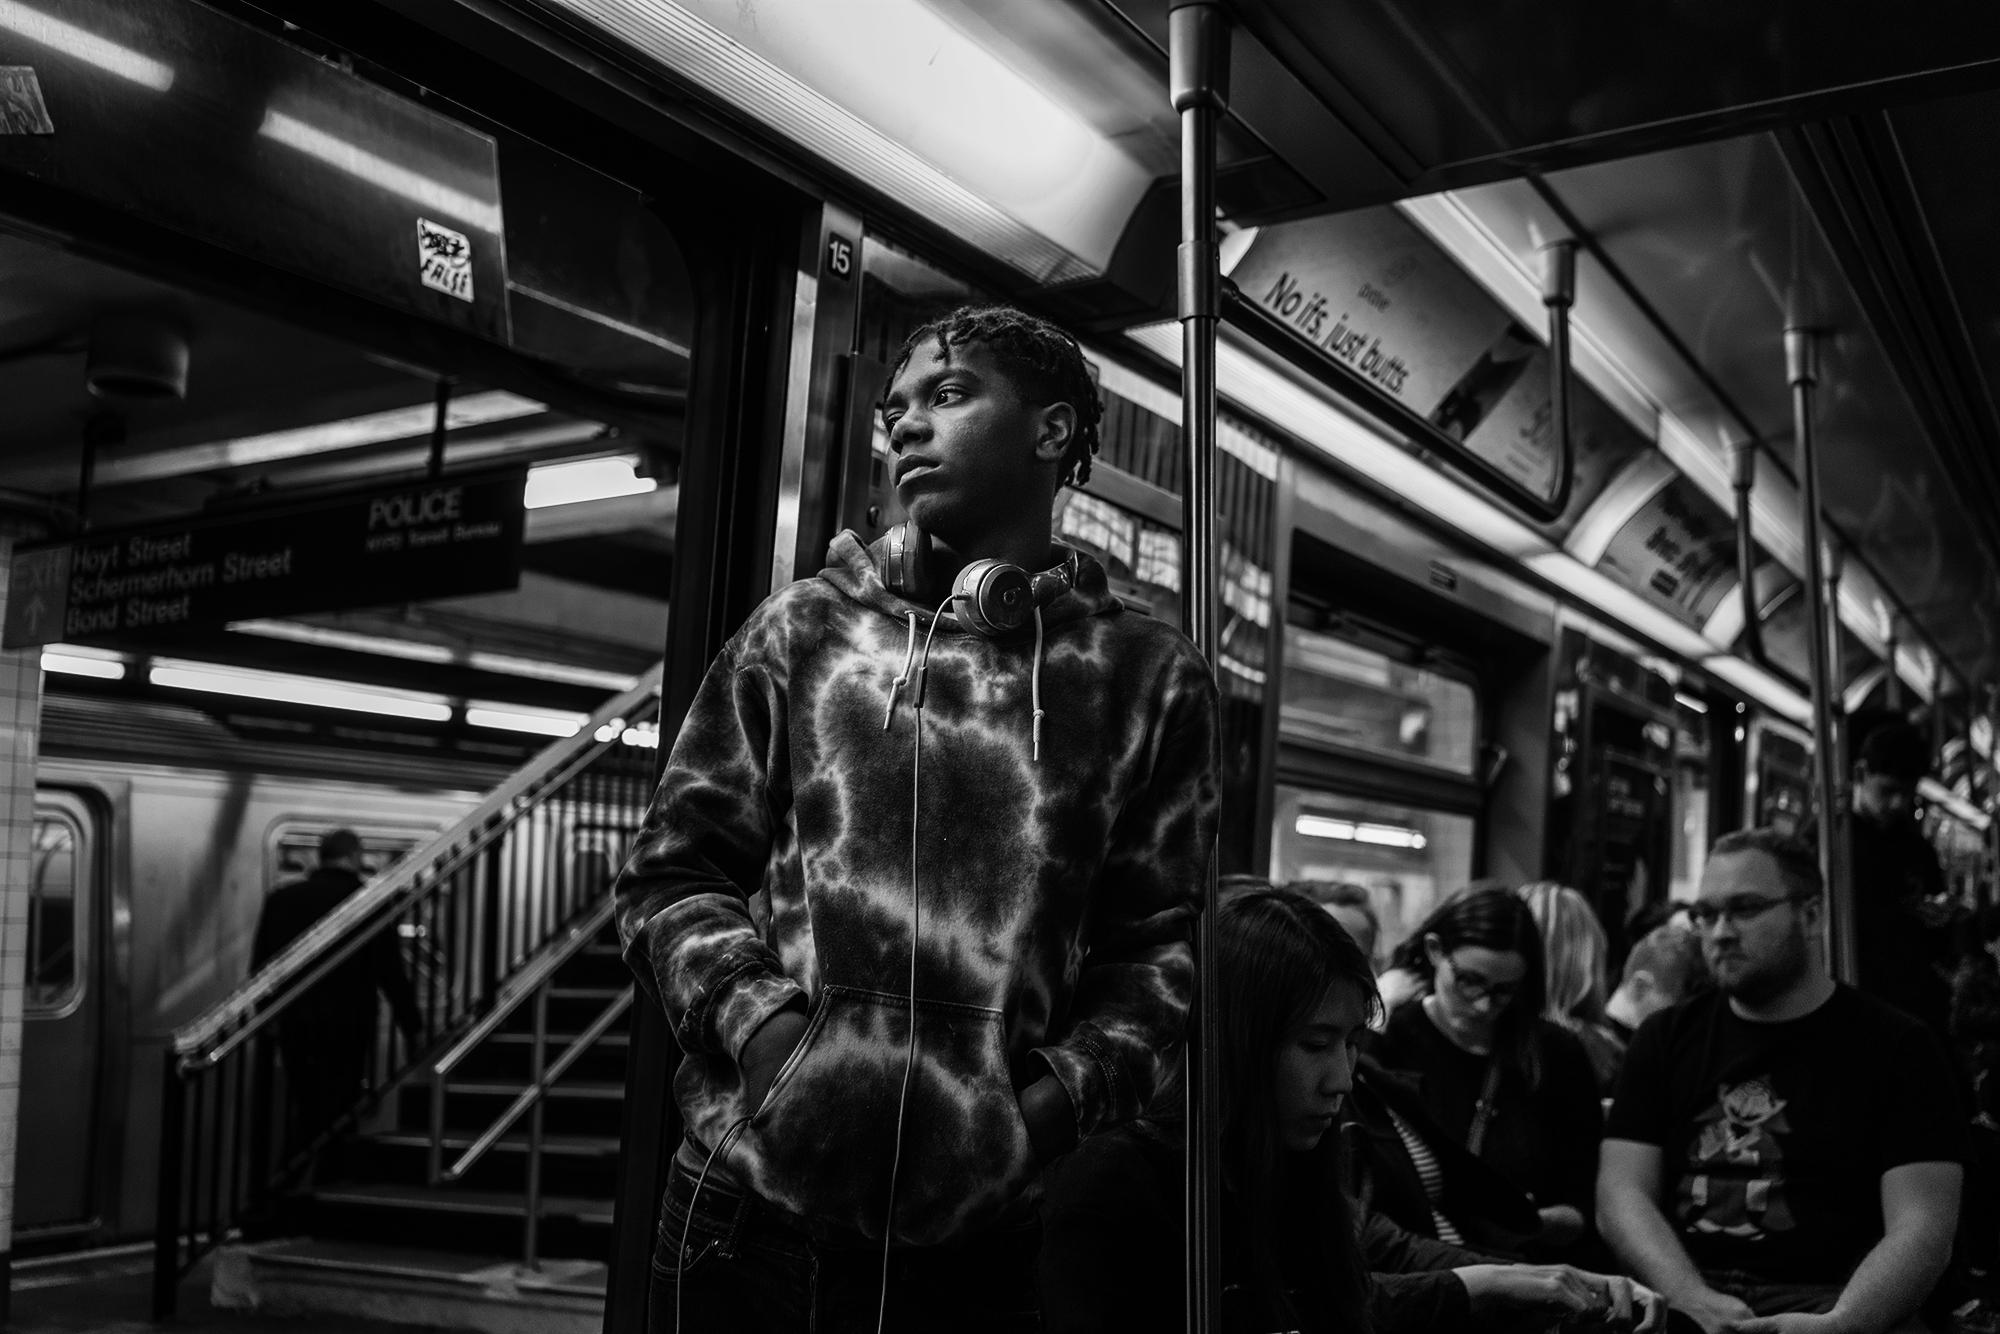 NYC_Subway_2018_Young_African_American_Gaze-003.jpg